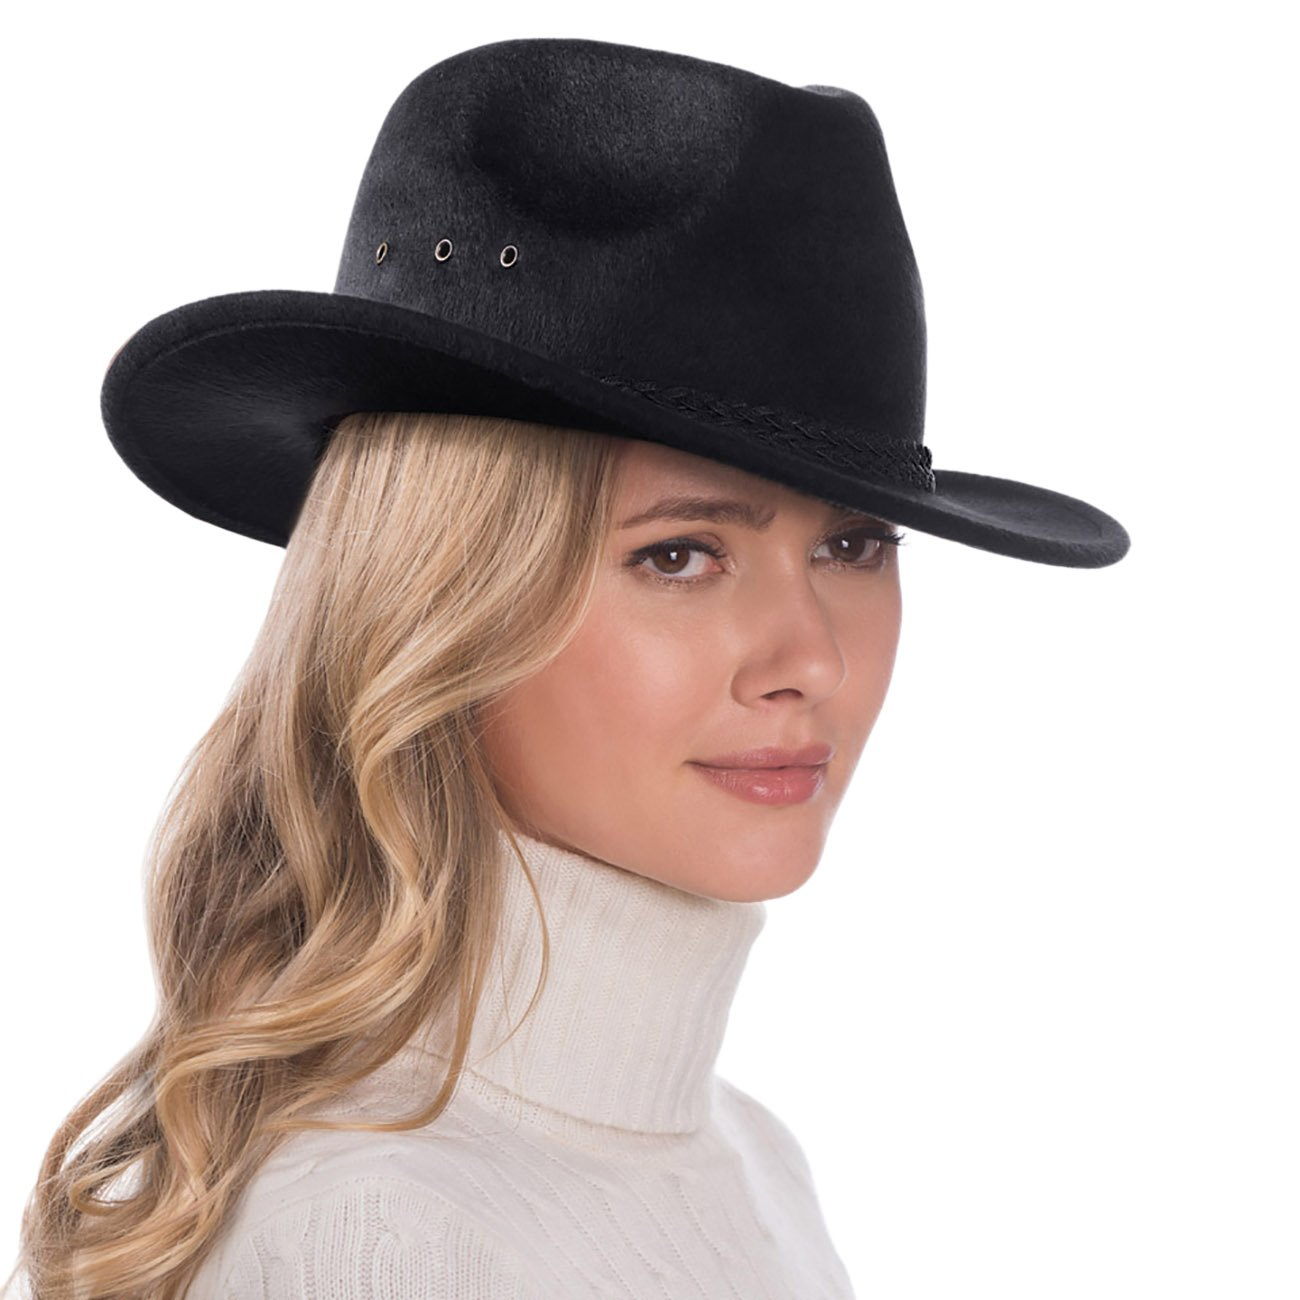 Eric Javits Luxury Fashion Designer Women's Headwear Hat - Stanwyck - Black by Eric Javits